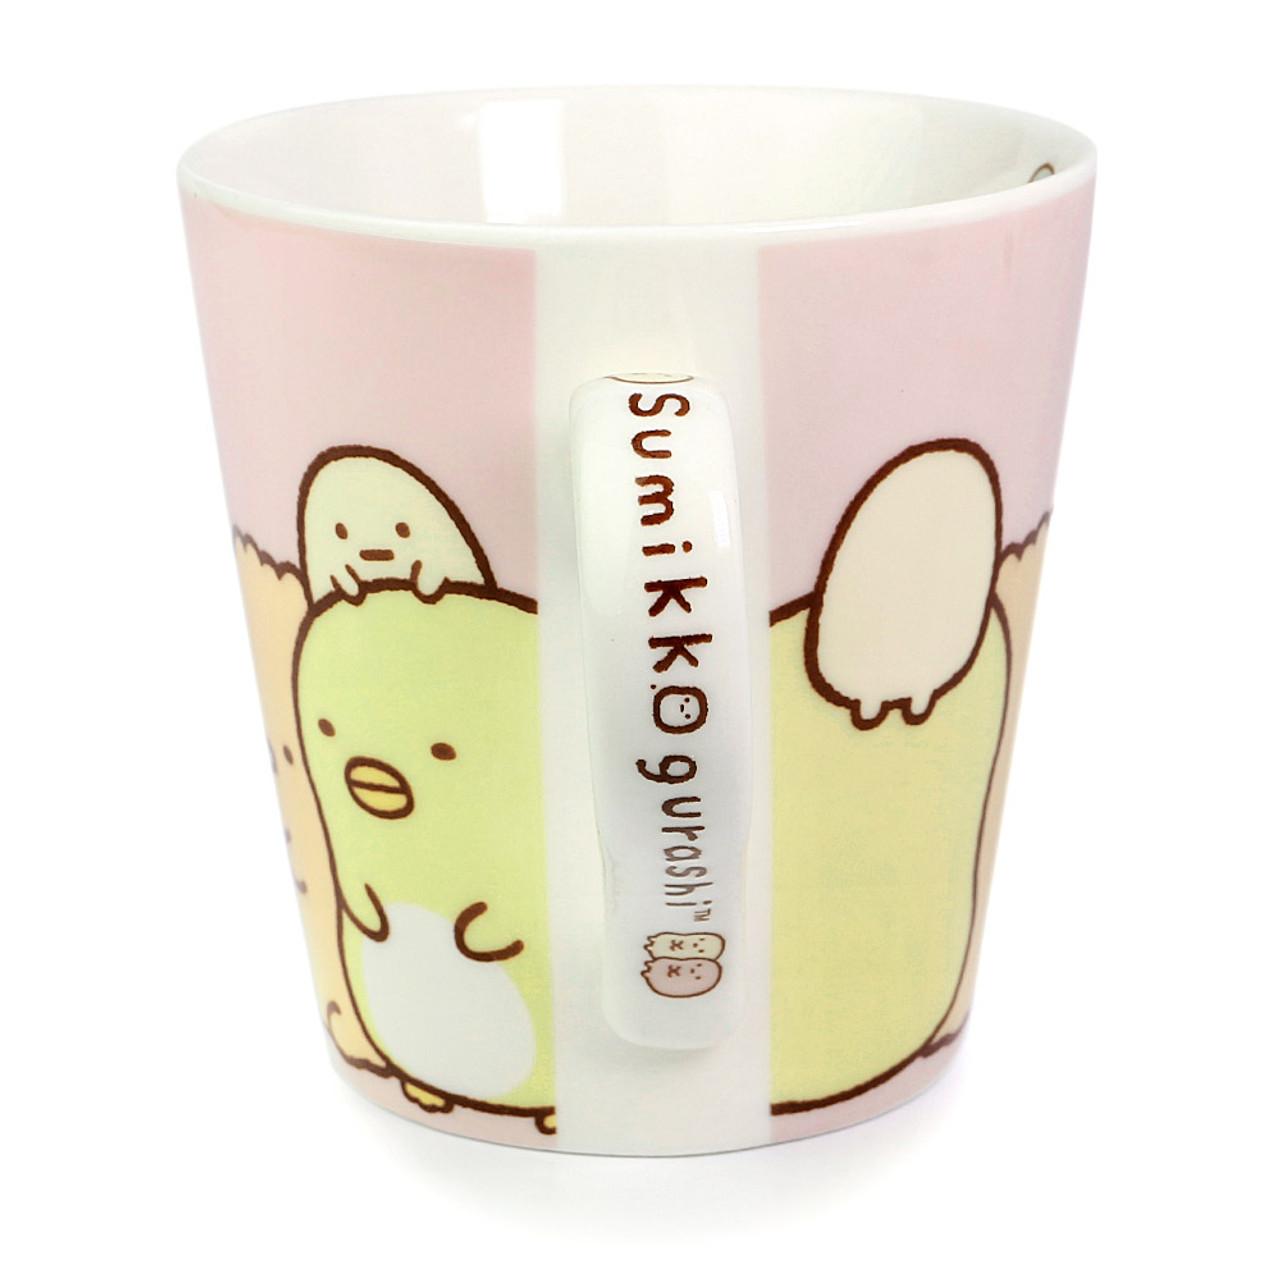 Sumikko Gurashi Measure Ceramic Cup - Horizontal ( Side View )